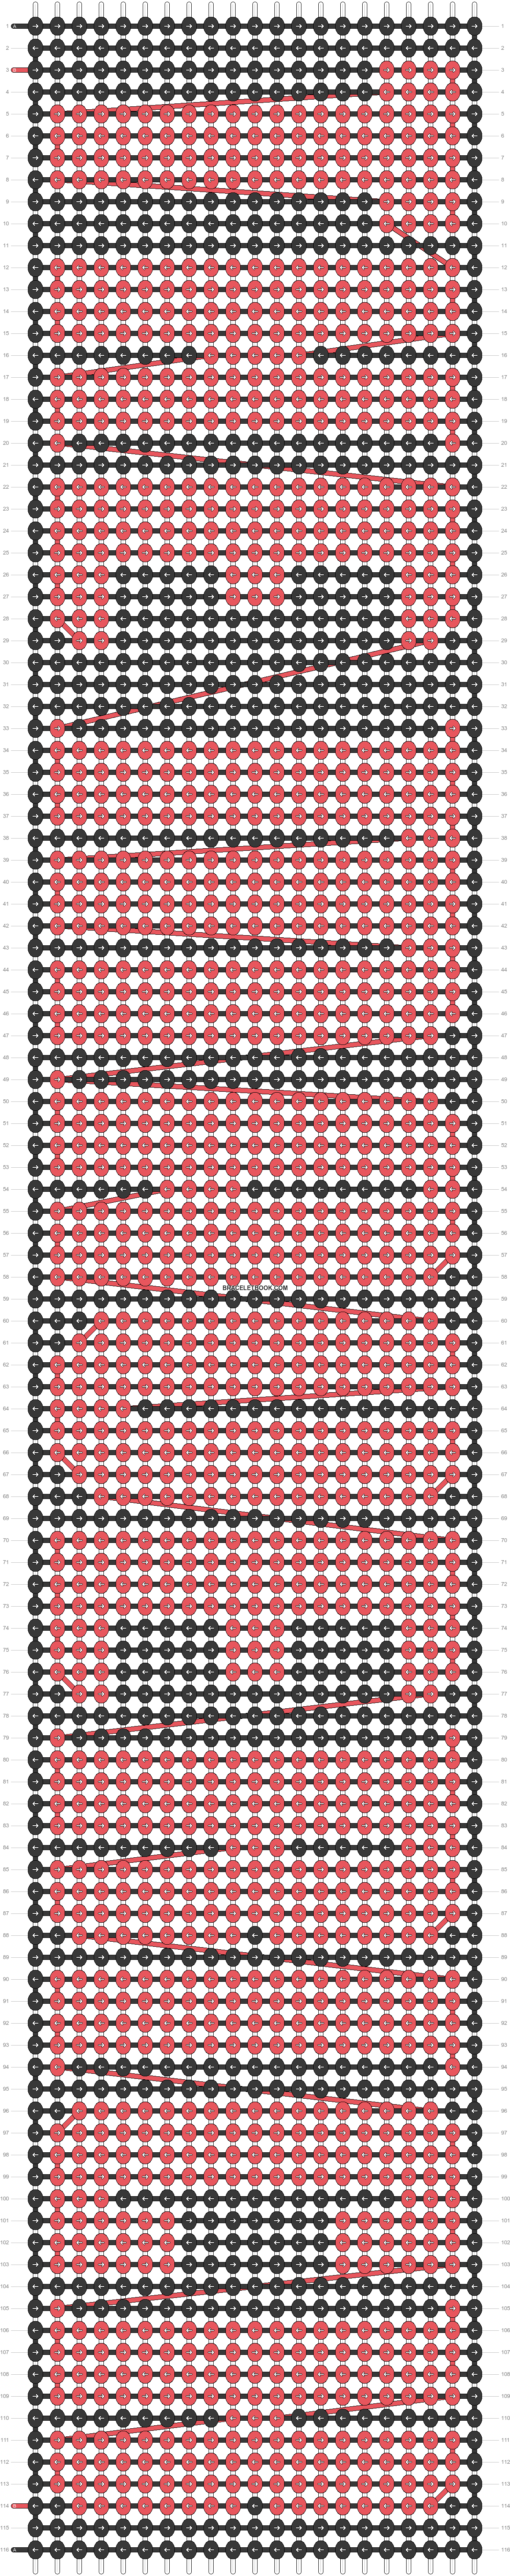 Alpha pattern #19061 pattern